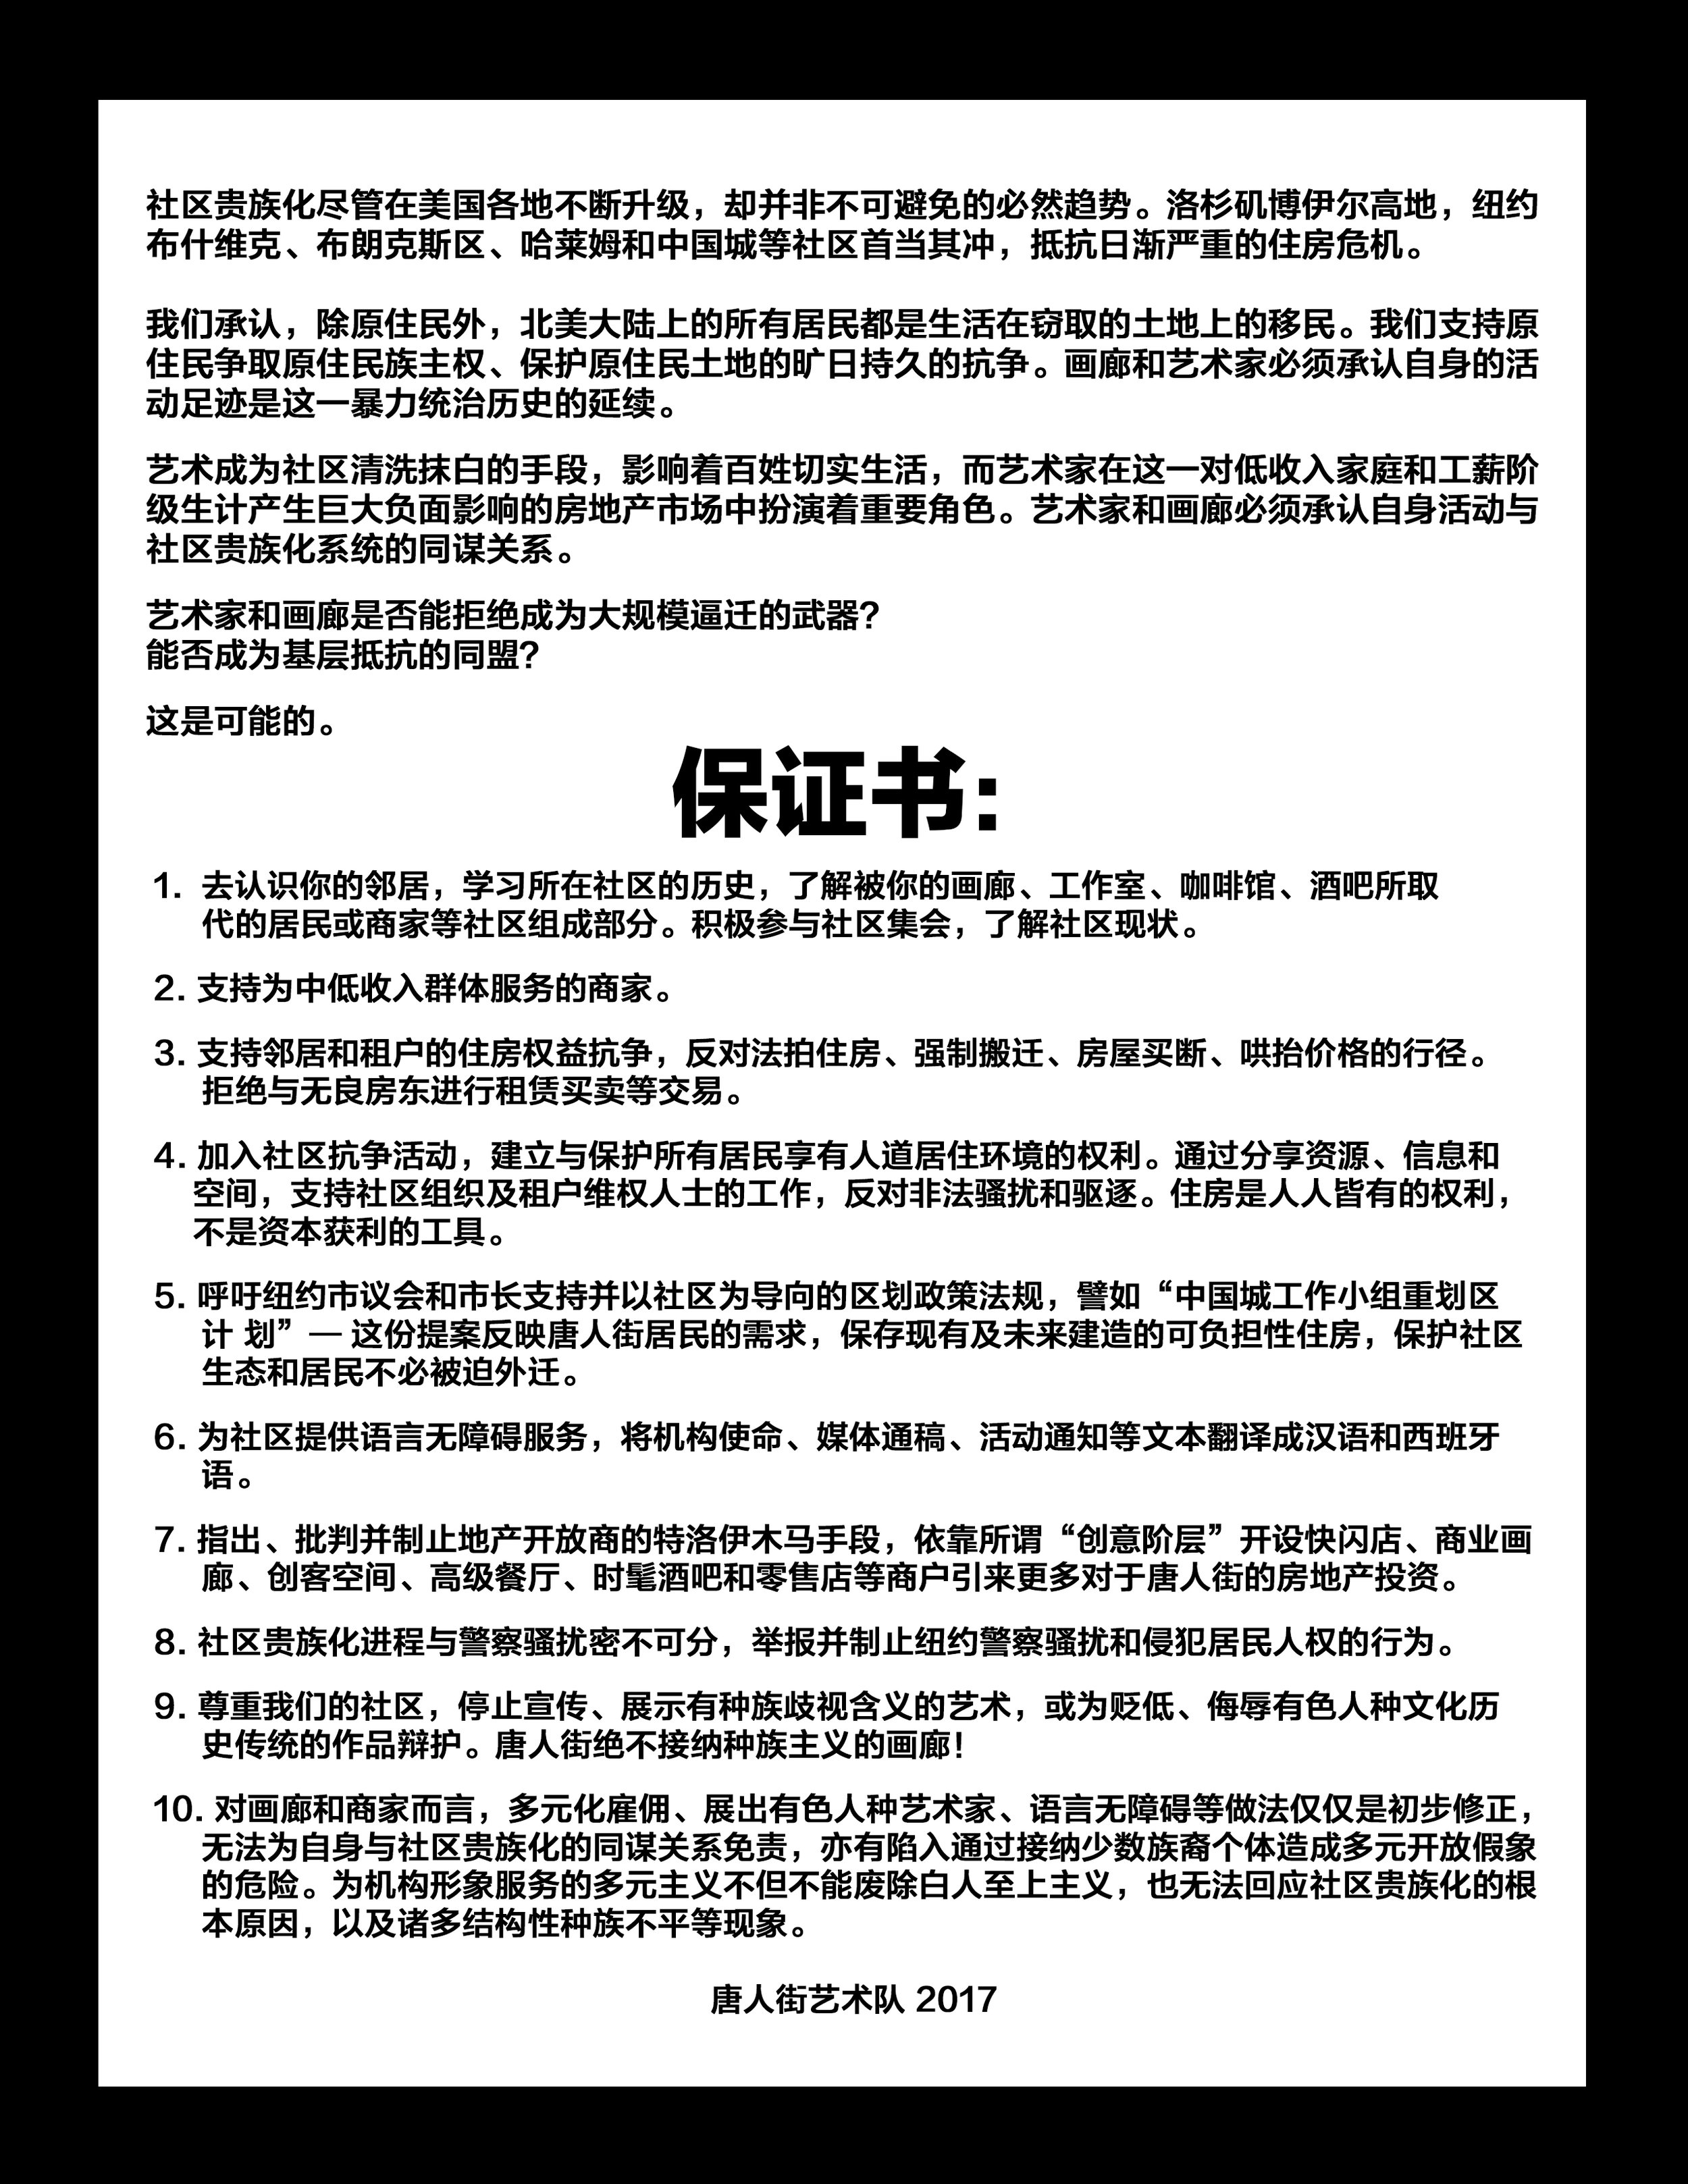 Copy of NewPledge_Chi.jpg